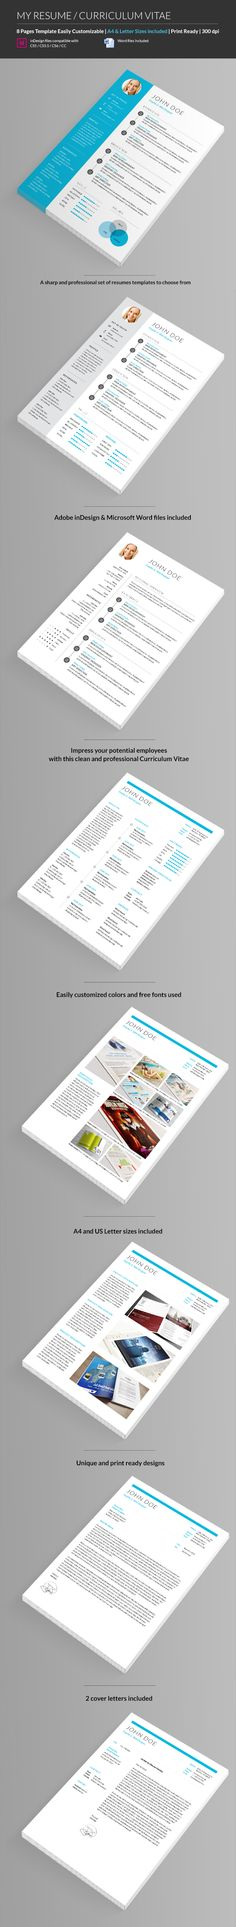 como-hacer-un-curriculum-vitae-infografia-Teresa-Alba-MadridNYC - how to make a killer resume